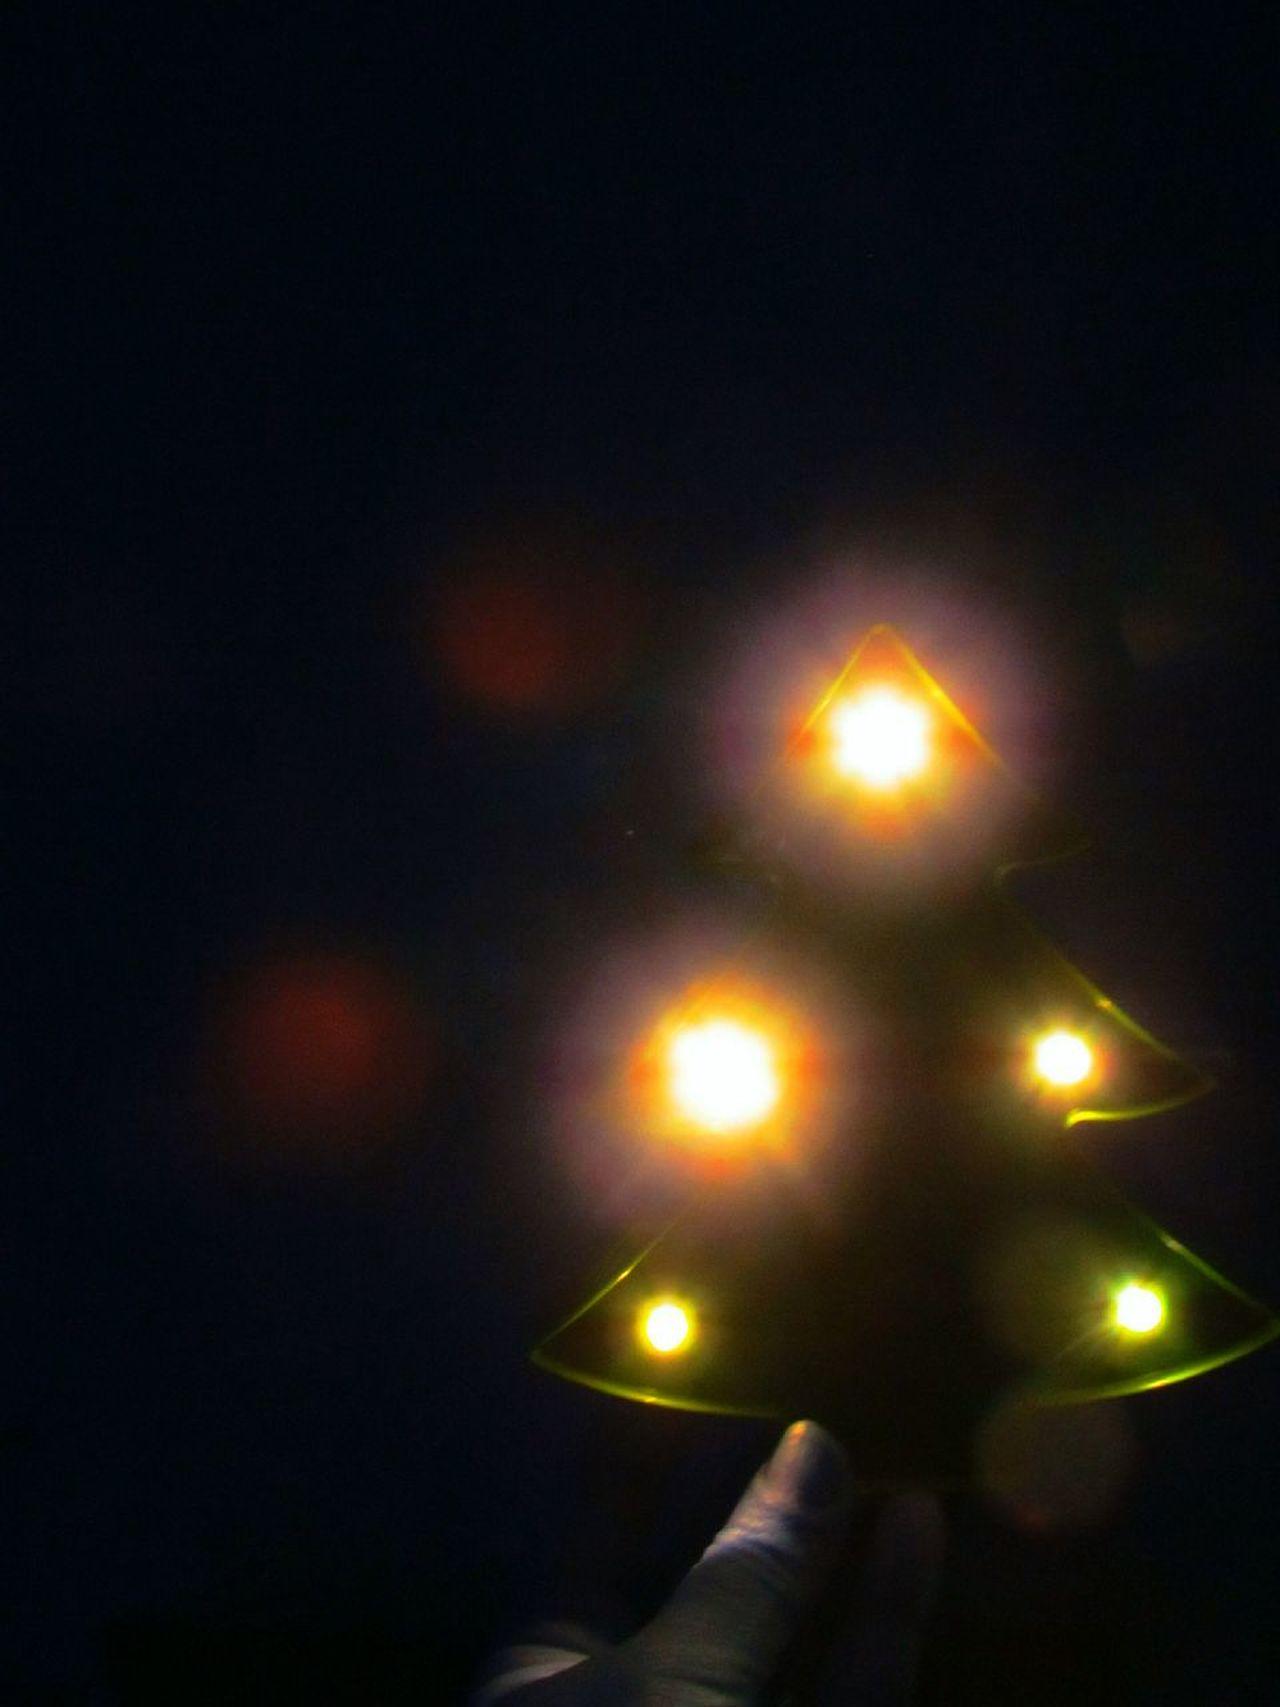 Night Illuminated Human Hand Black Background Close-up Christmas Tree Shape Bokeh Effect Bokeh Balls Bokeh Lights Light In The Darkness Light Effect Light And Darkness, Forms And Shapes Light And Darkness